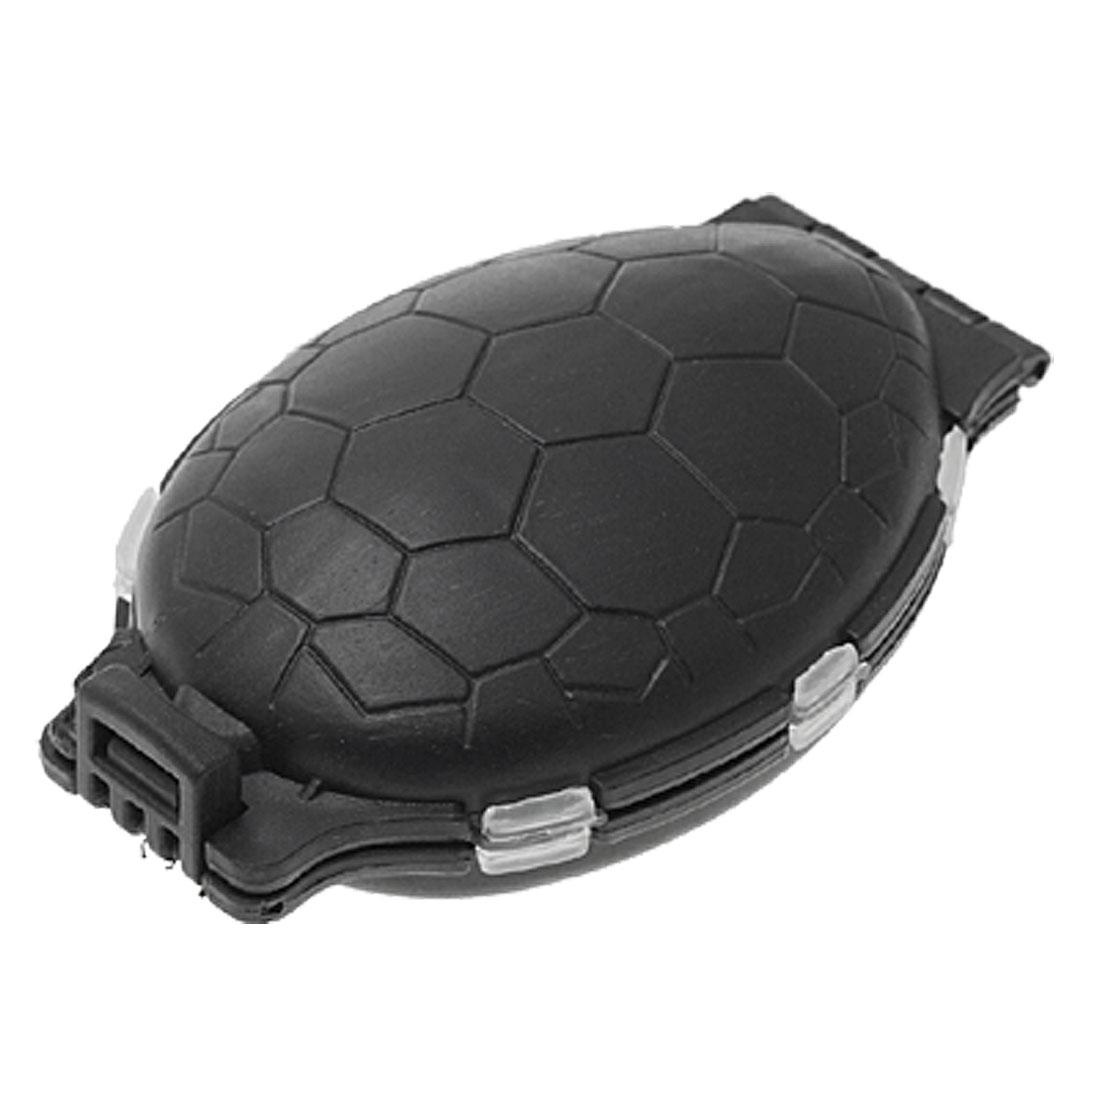 Tortoise Shaped Mutli-Compartment Plastic Fishing Tackle Case Box